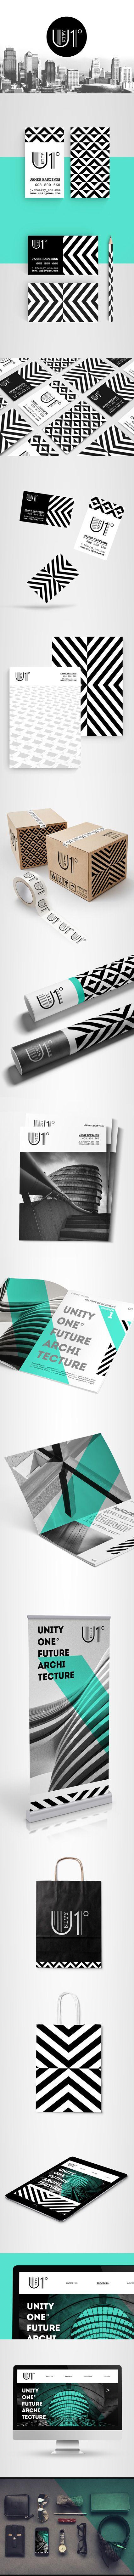 Identity concept created for modern architecture studio.